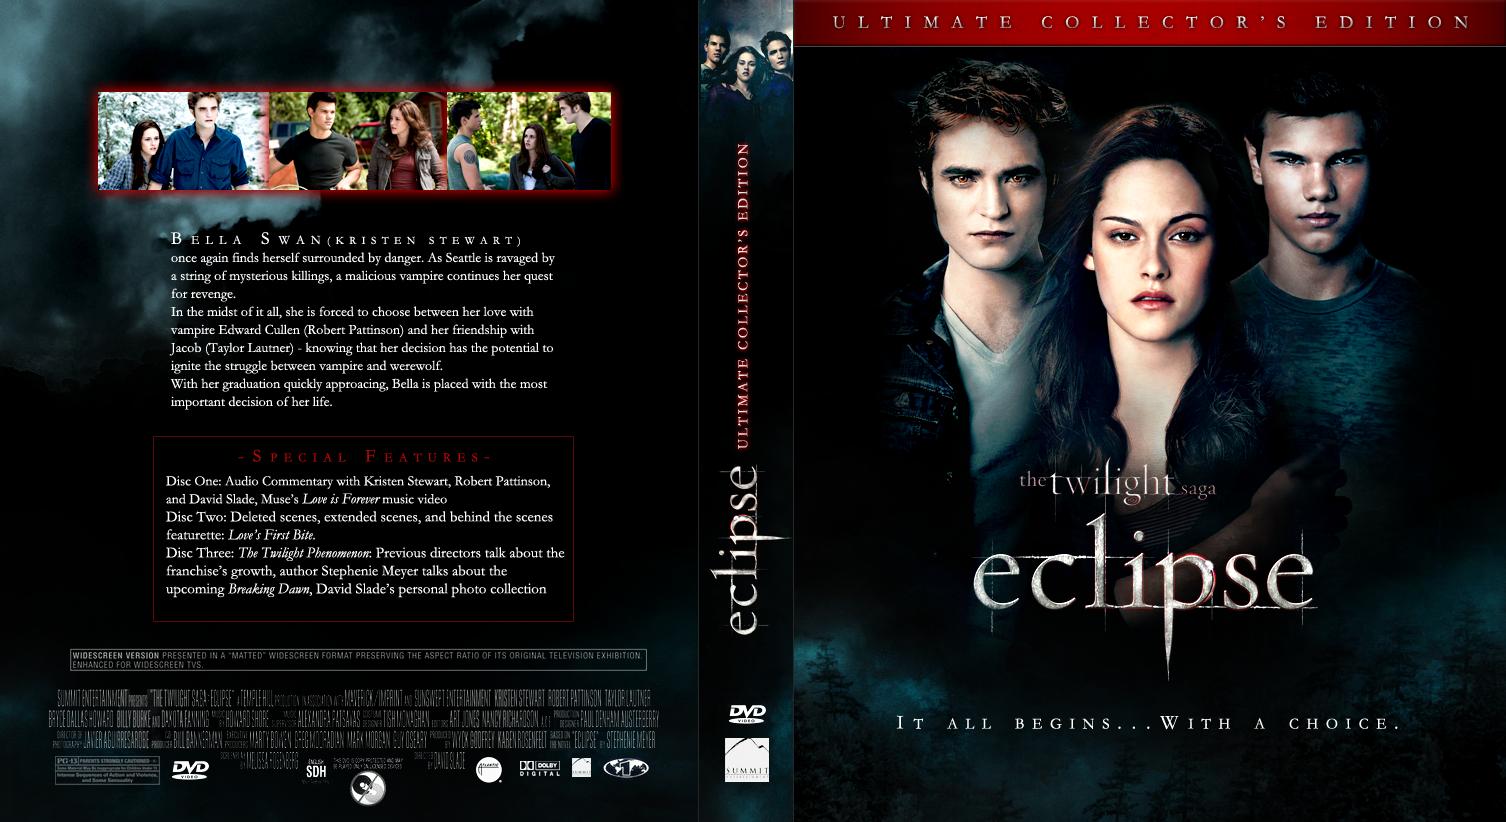 dvd covers twilight saga eclipse 2010 dvd cover